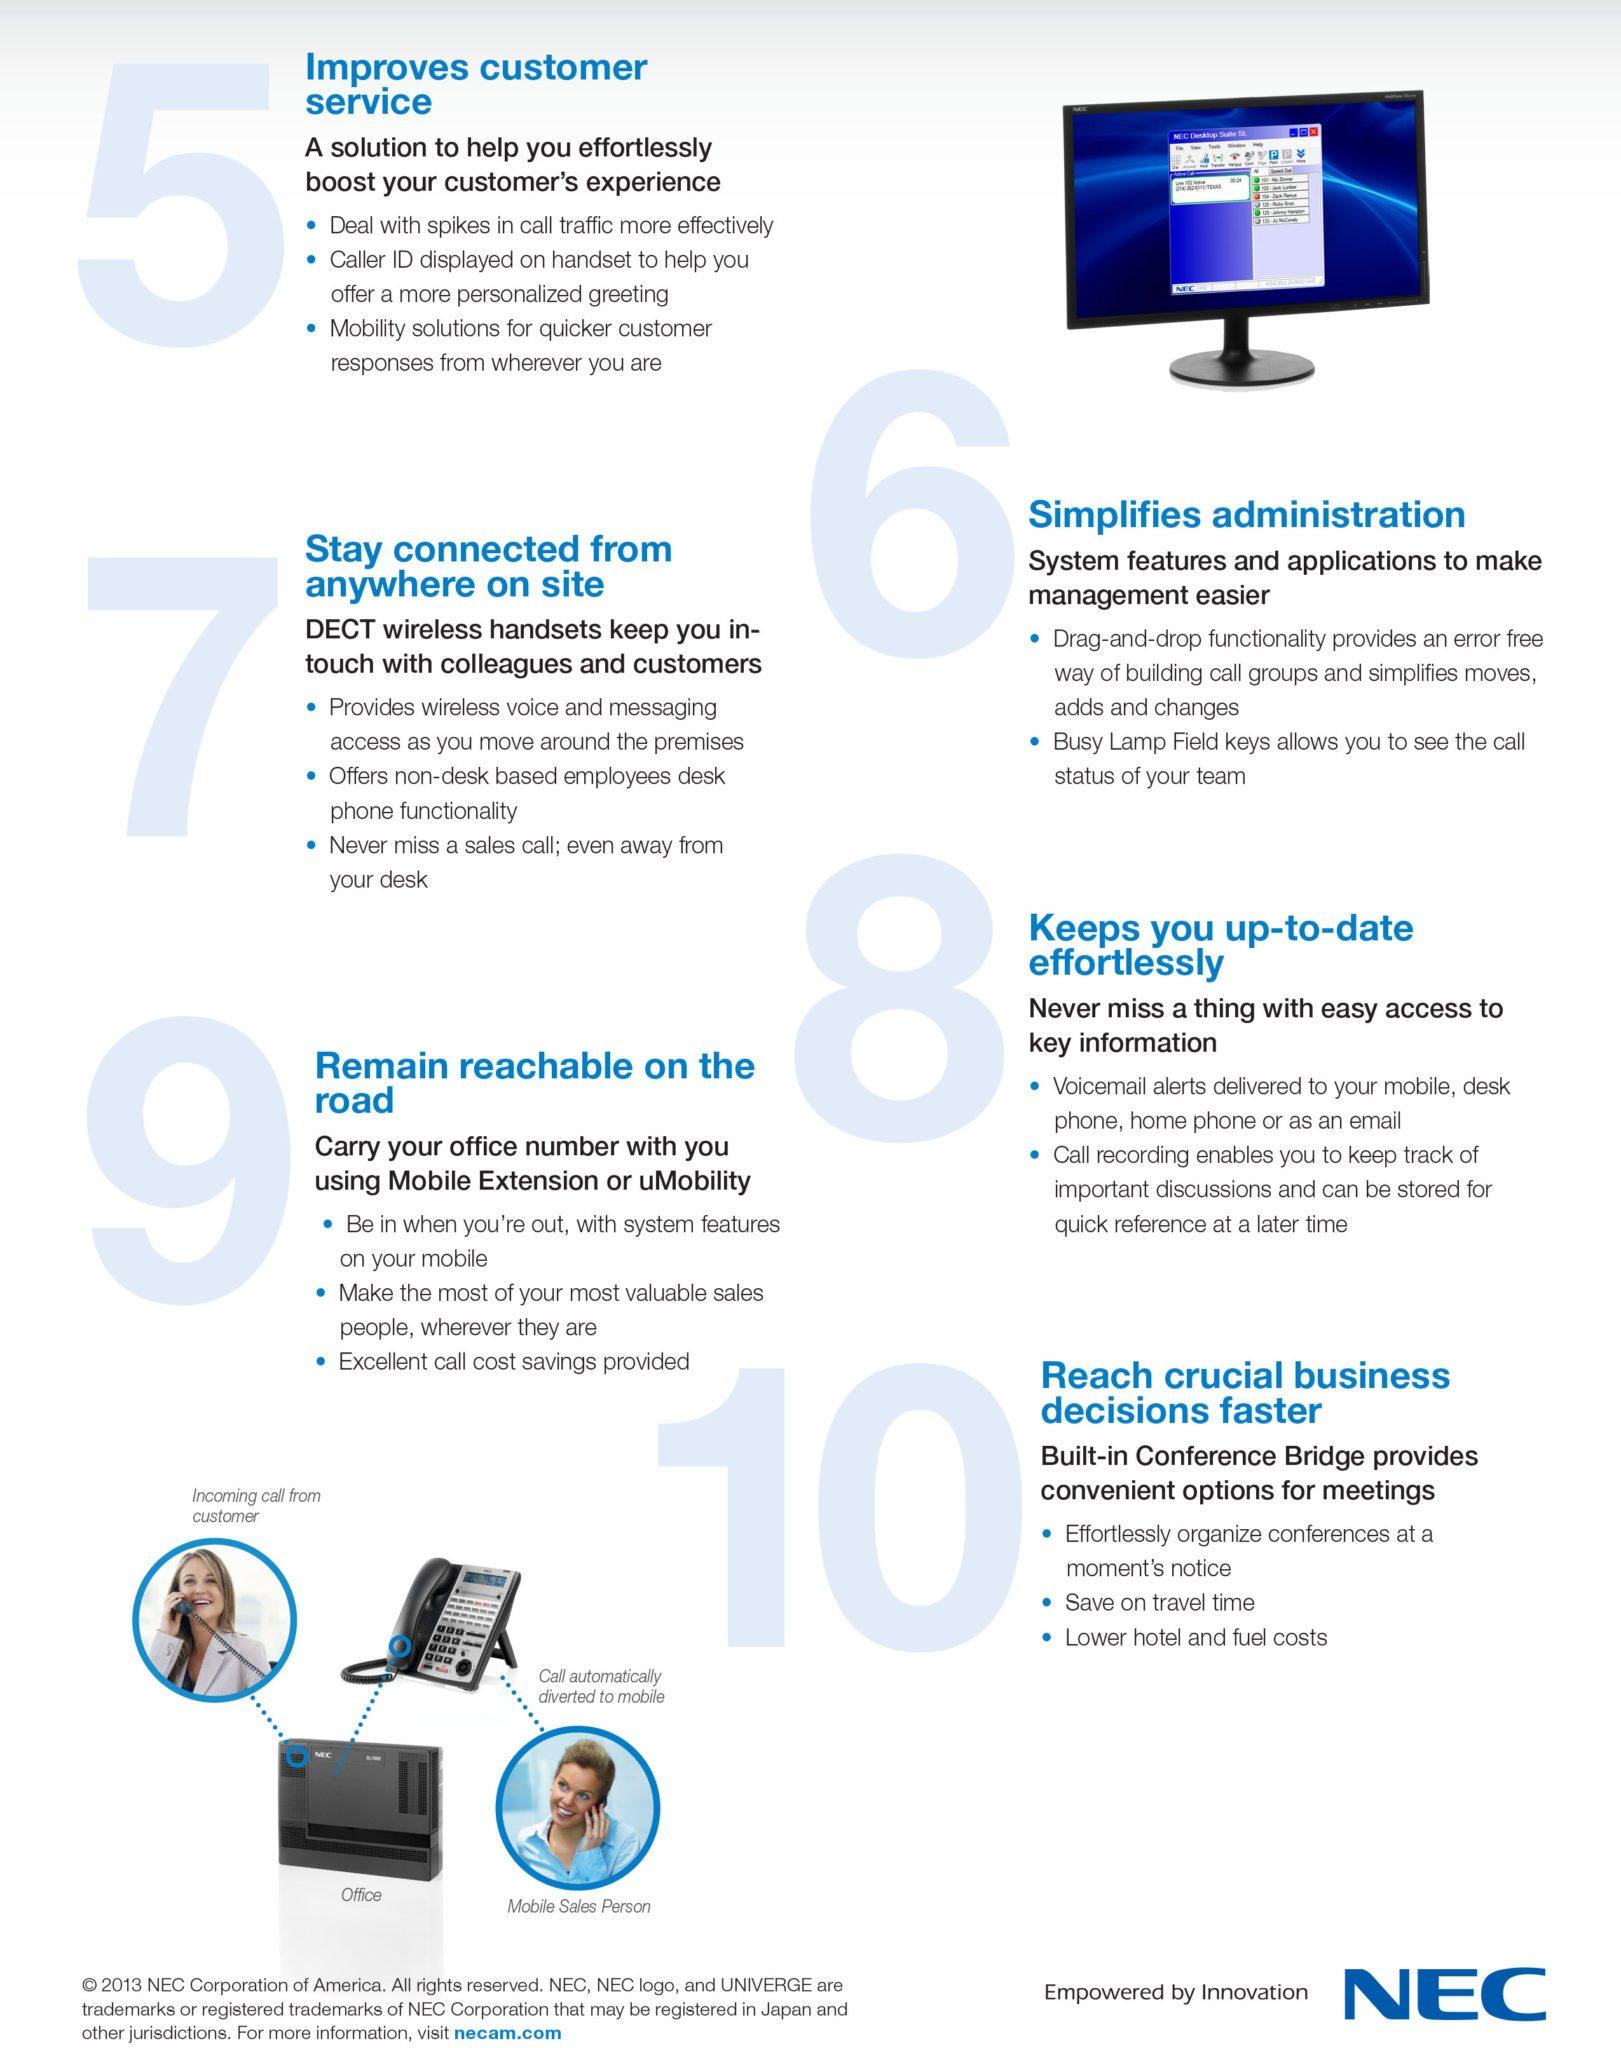 NEC_SL1100_Benefits-2